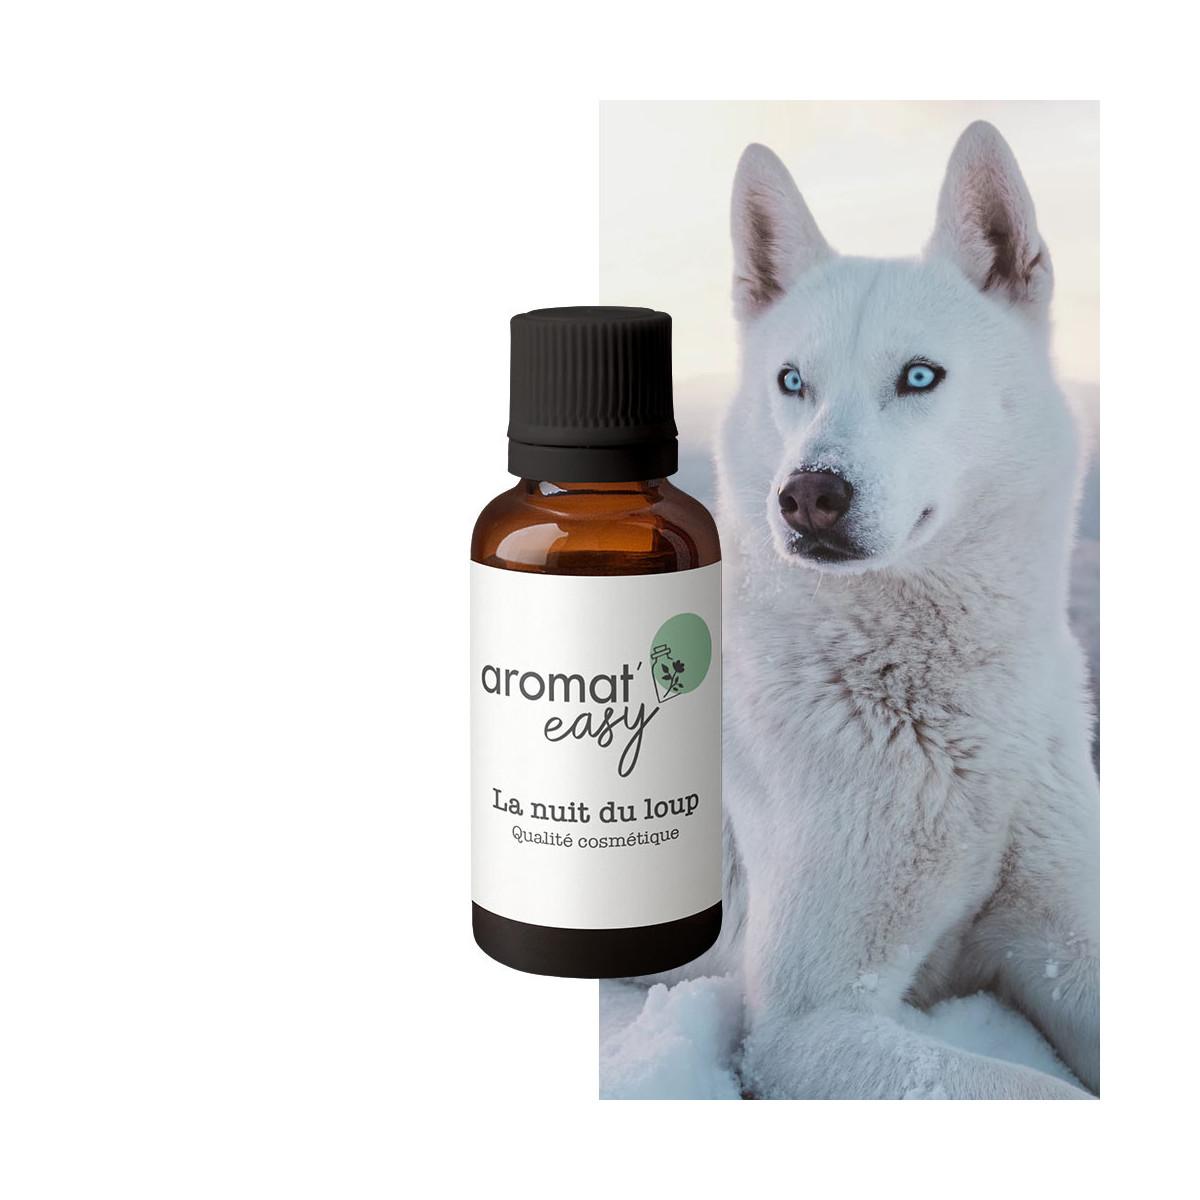 Fragrance La nuit du loup